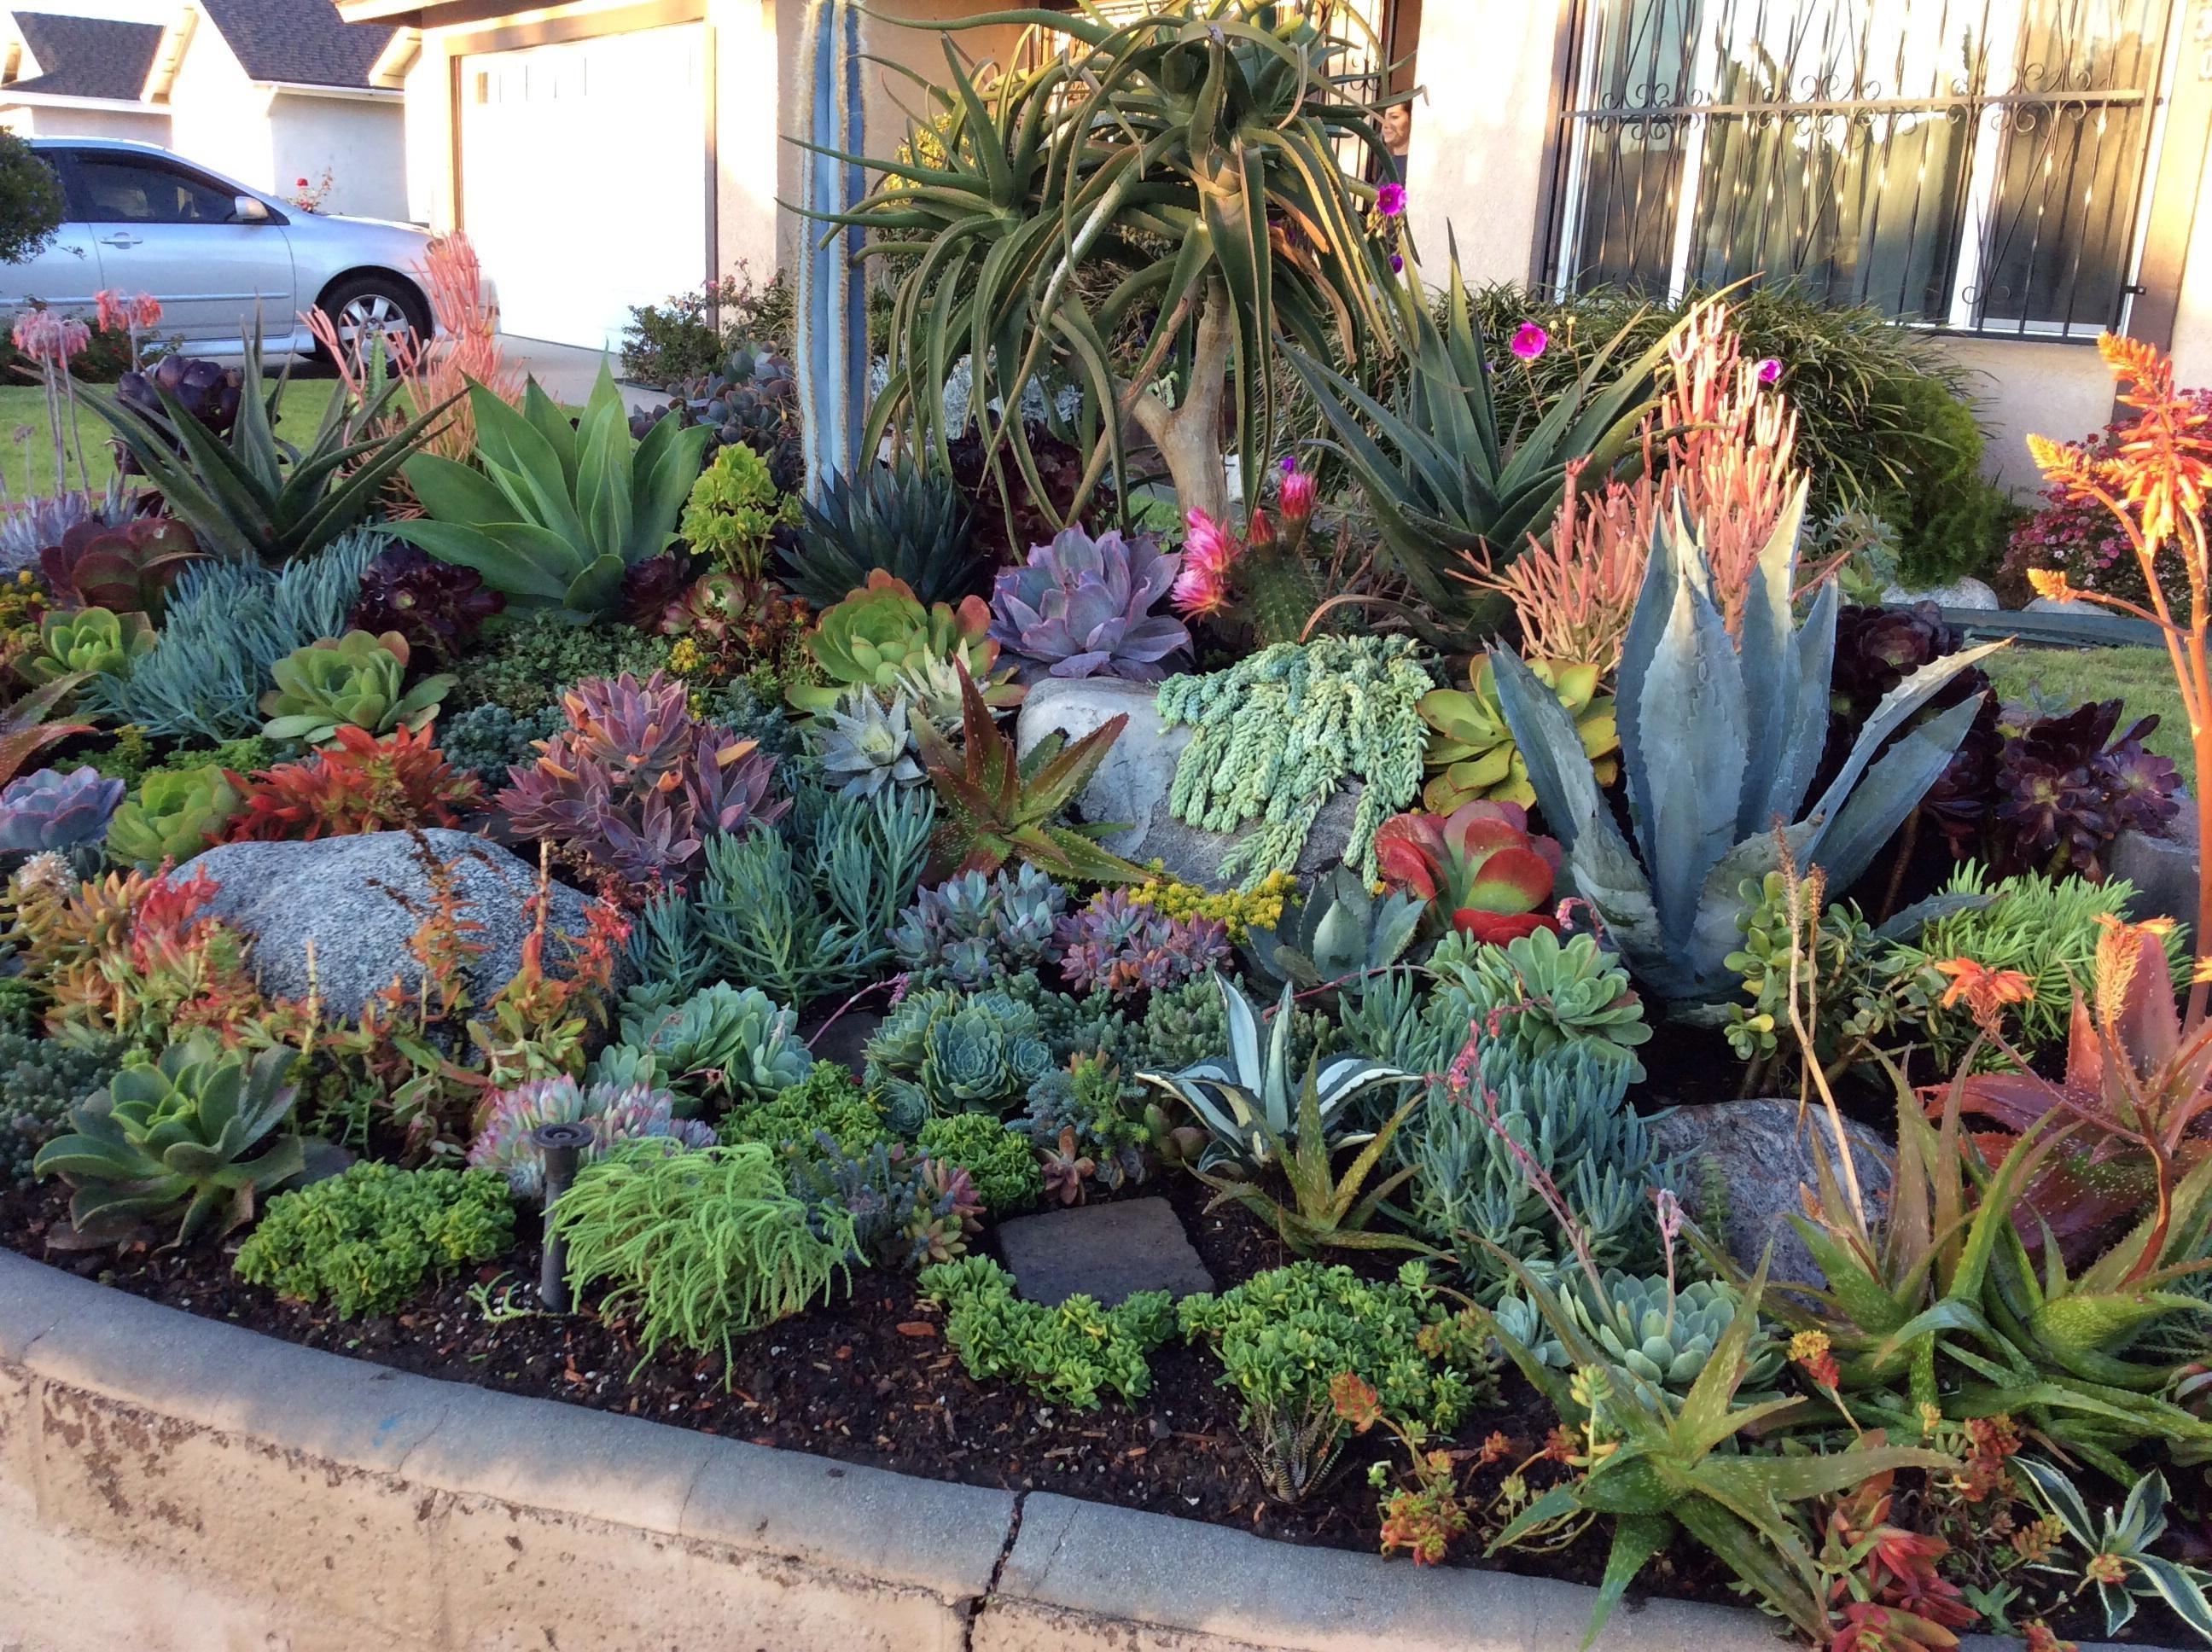 Drag to resize or shift drag to move garden pinterest - Photo de jardin exotique ...